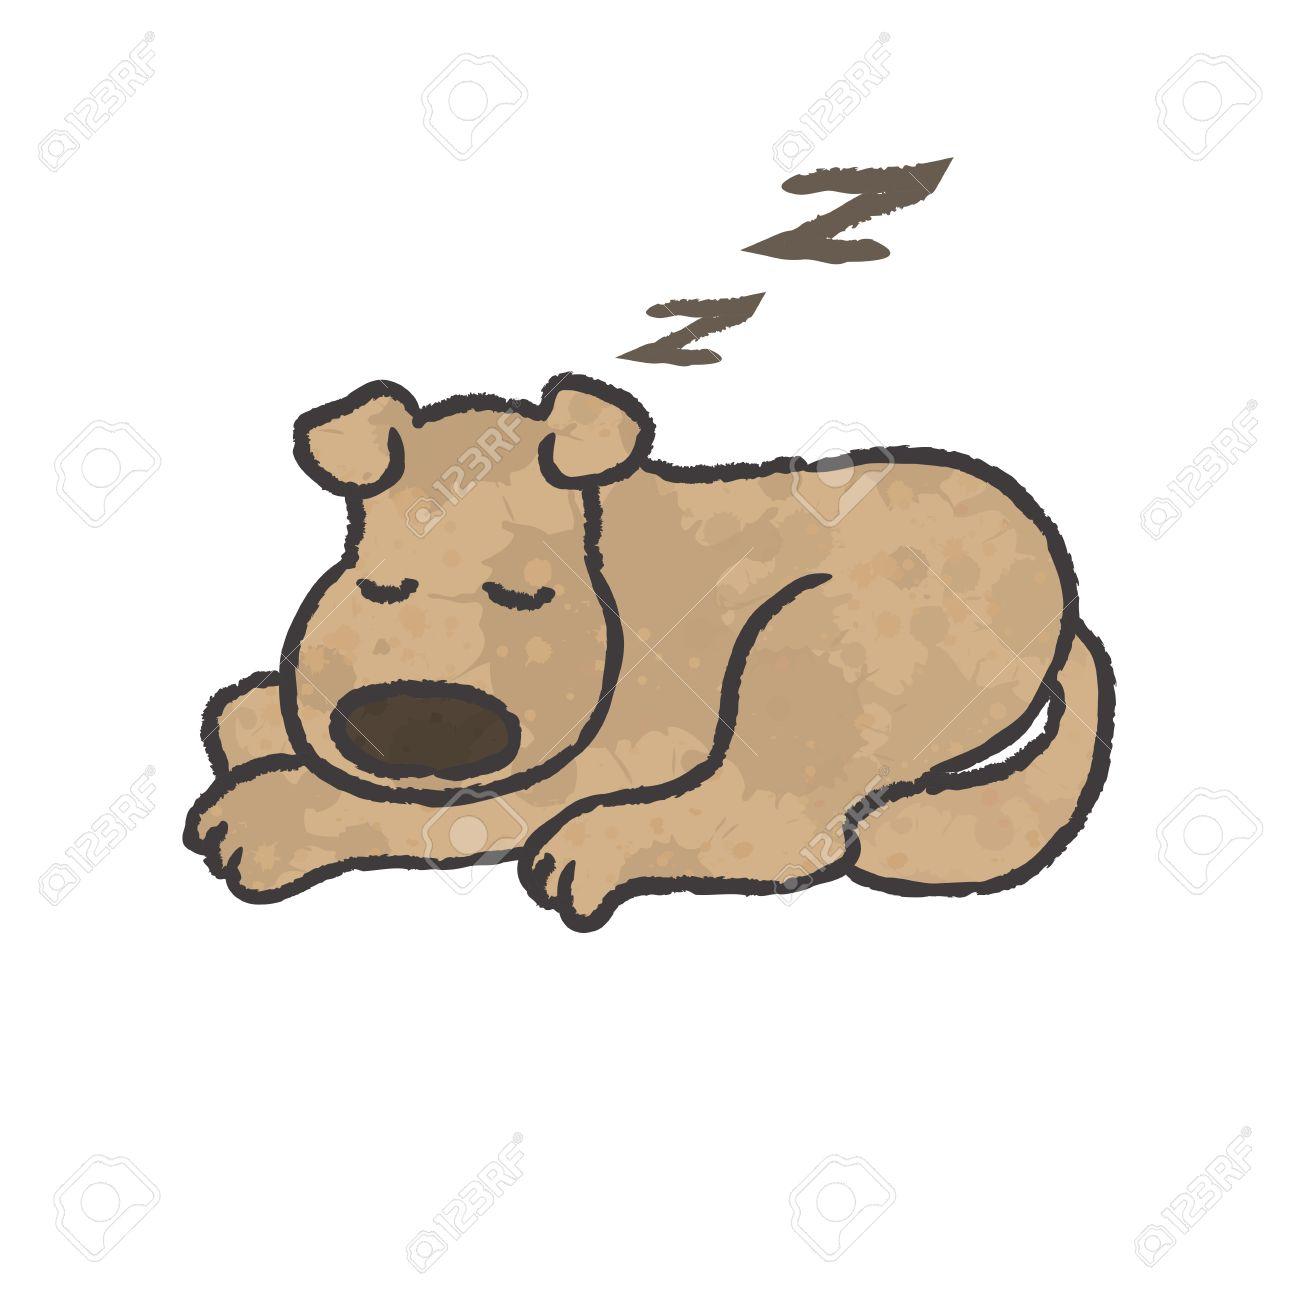 hight resolution of sleep dog cartoon vector stock vector 27516074